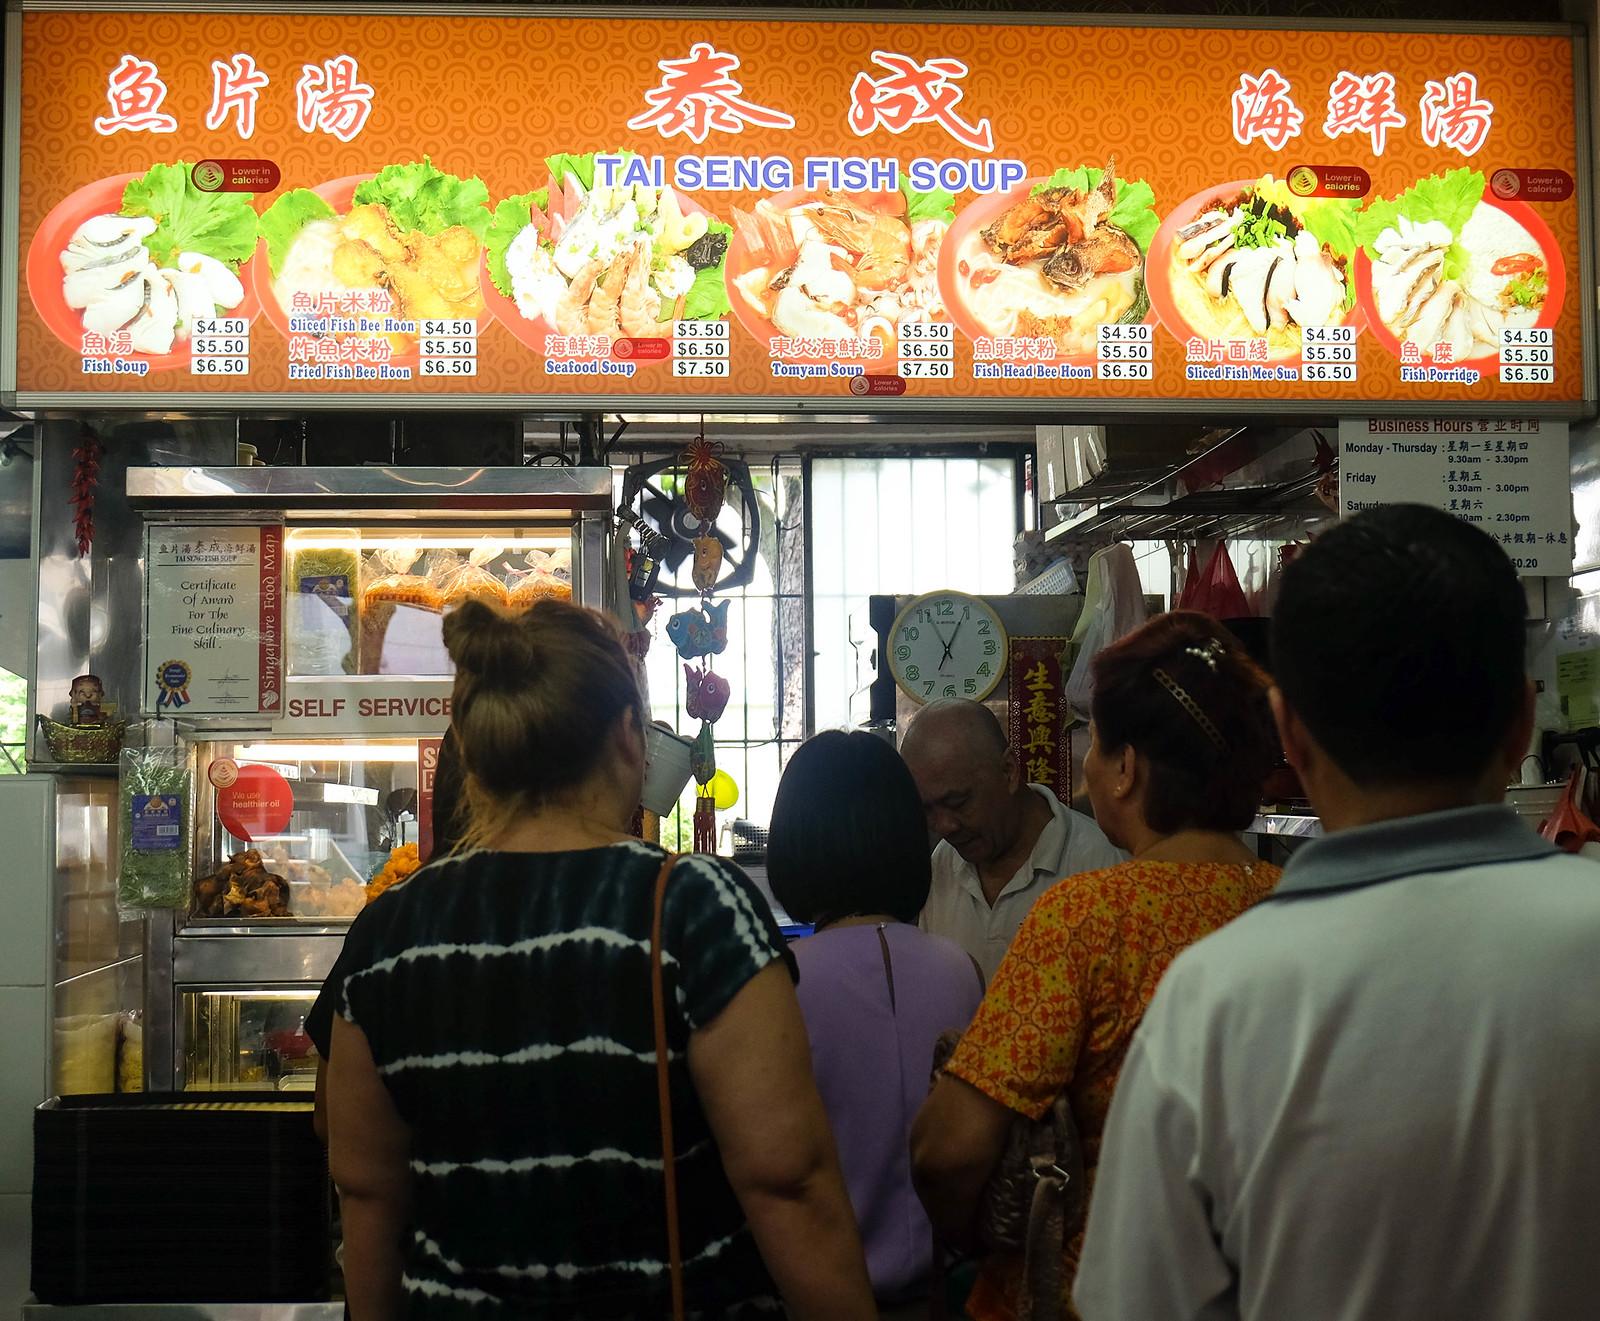 tai seng fish soup storefront_2